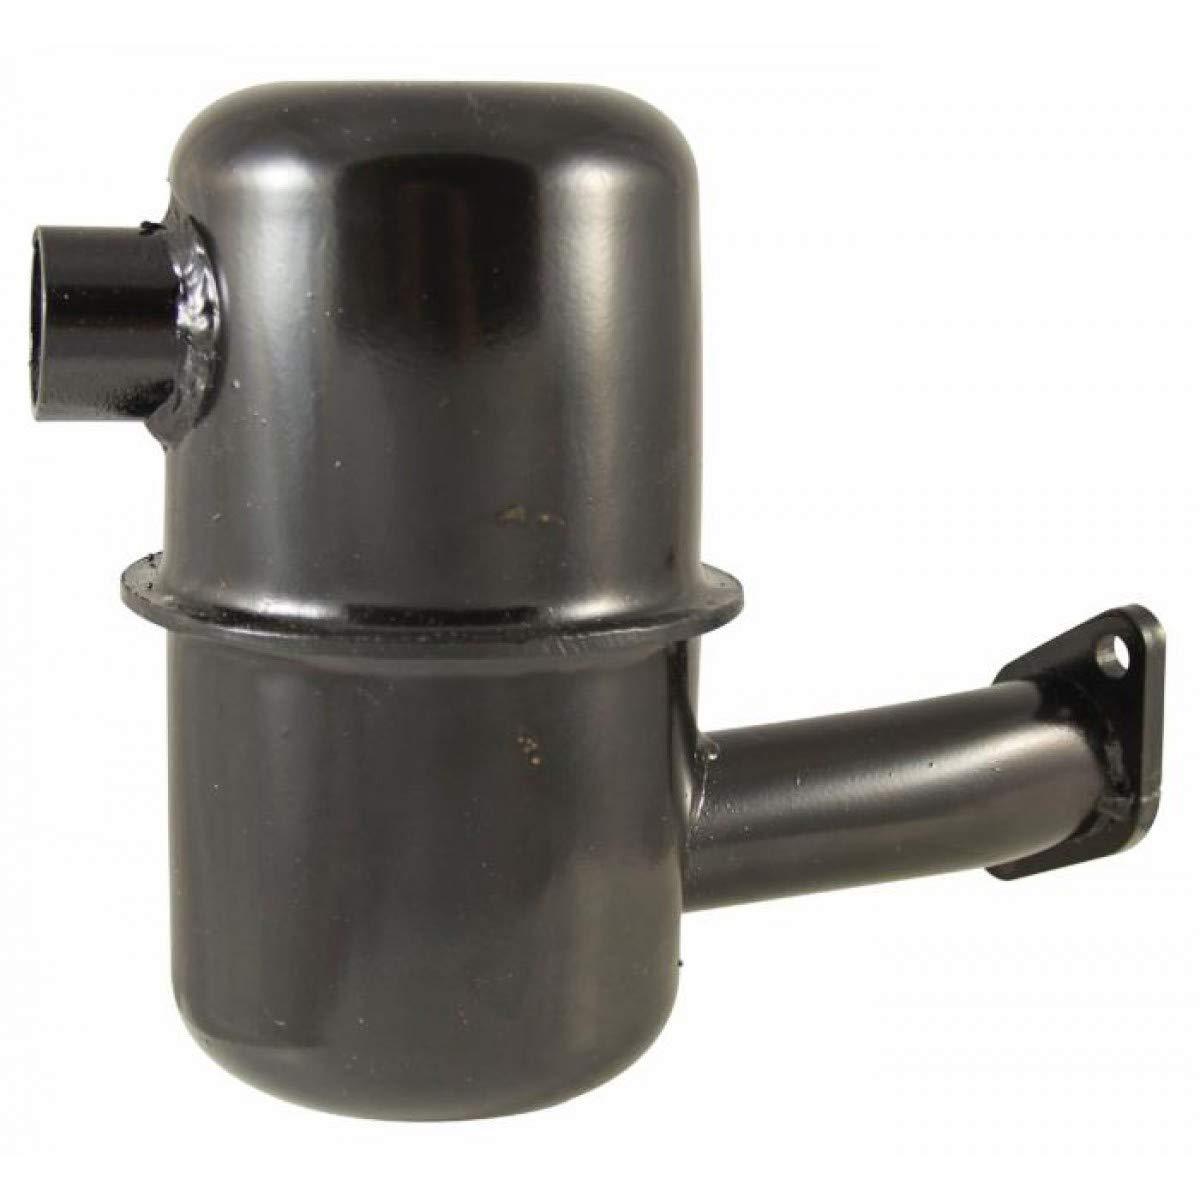 Le gusta 03400/silenciador Adaptable A im300 im350/lombardini